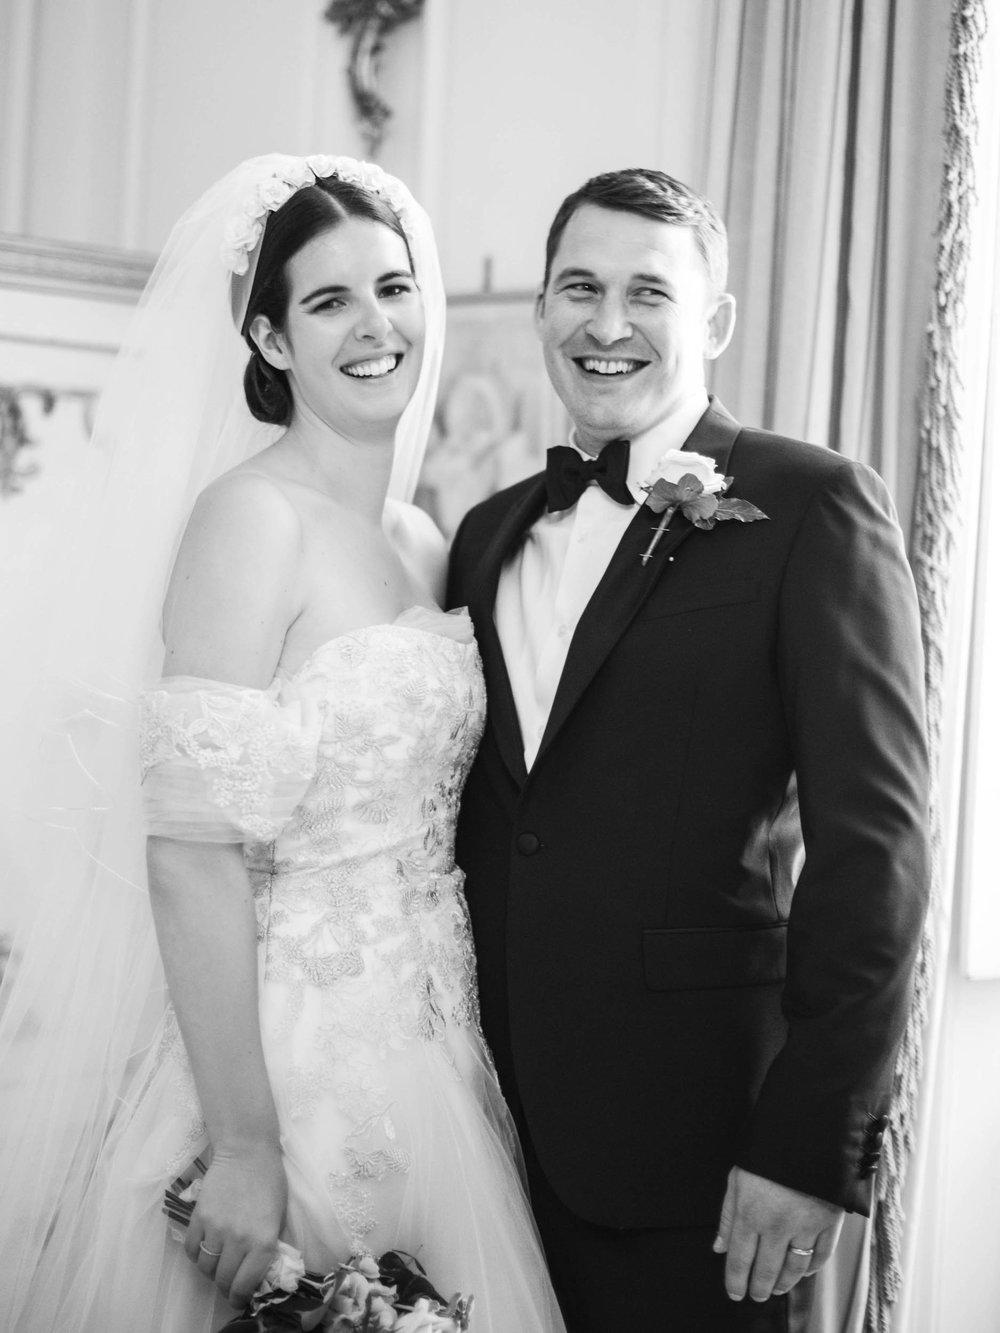 Amy O'Boyle Photography- Destination & UK Fine Art Film Wedding Photographer- Stoneleigh Abbey Wedding-62.jpg